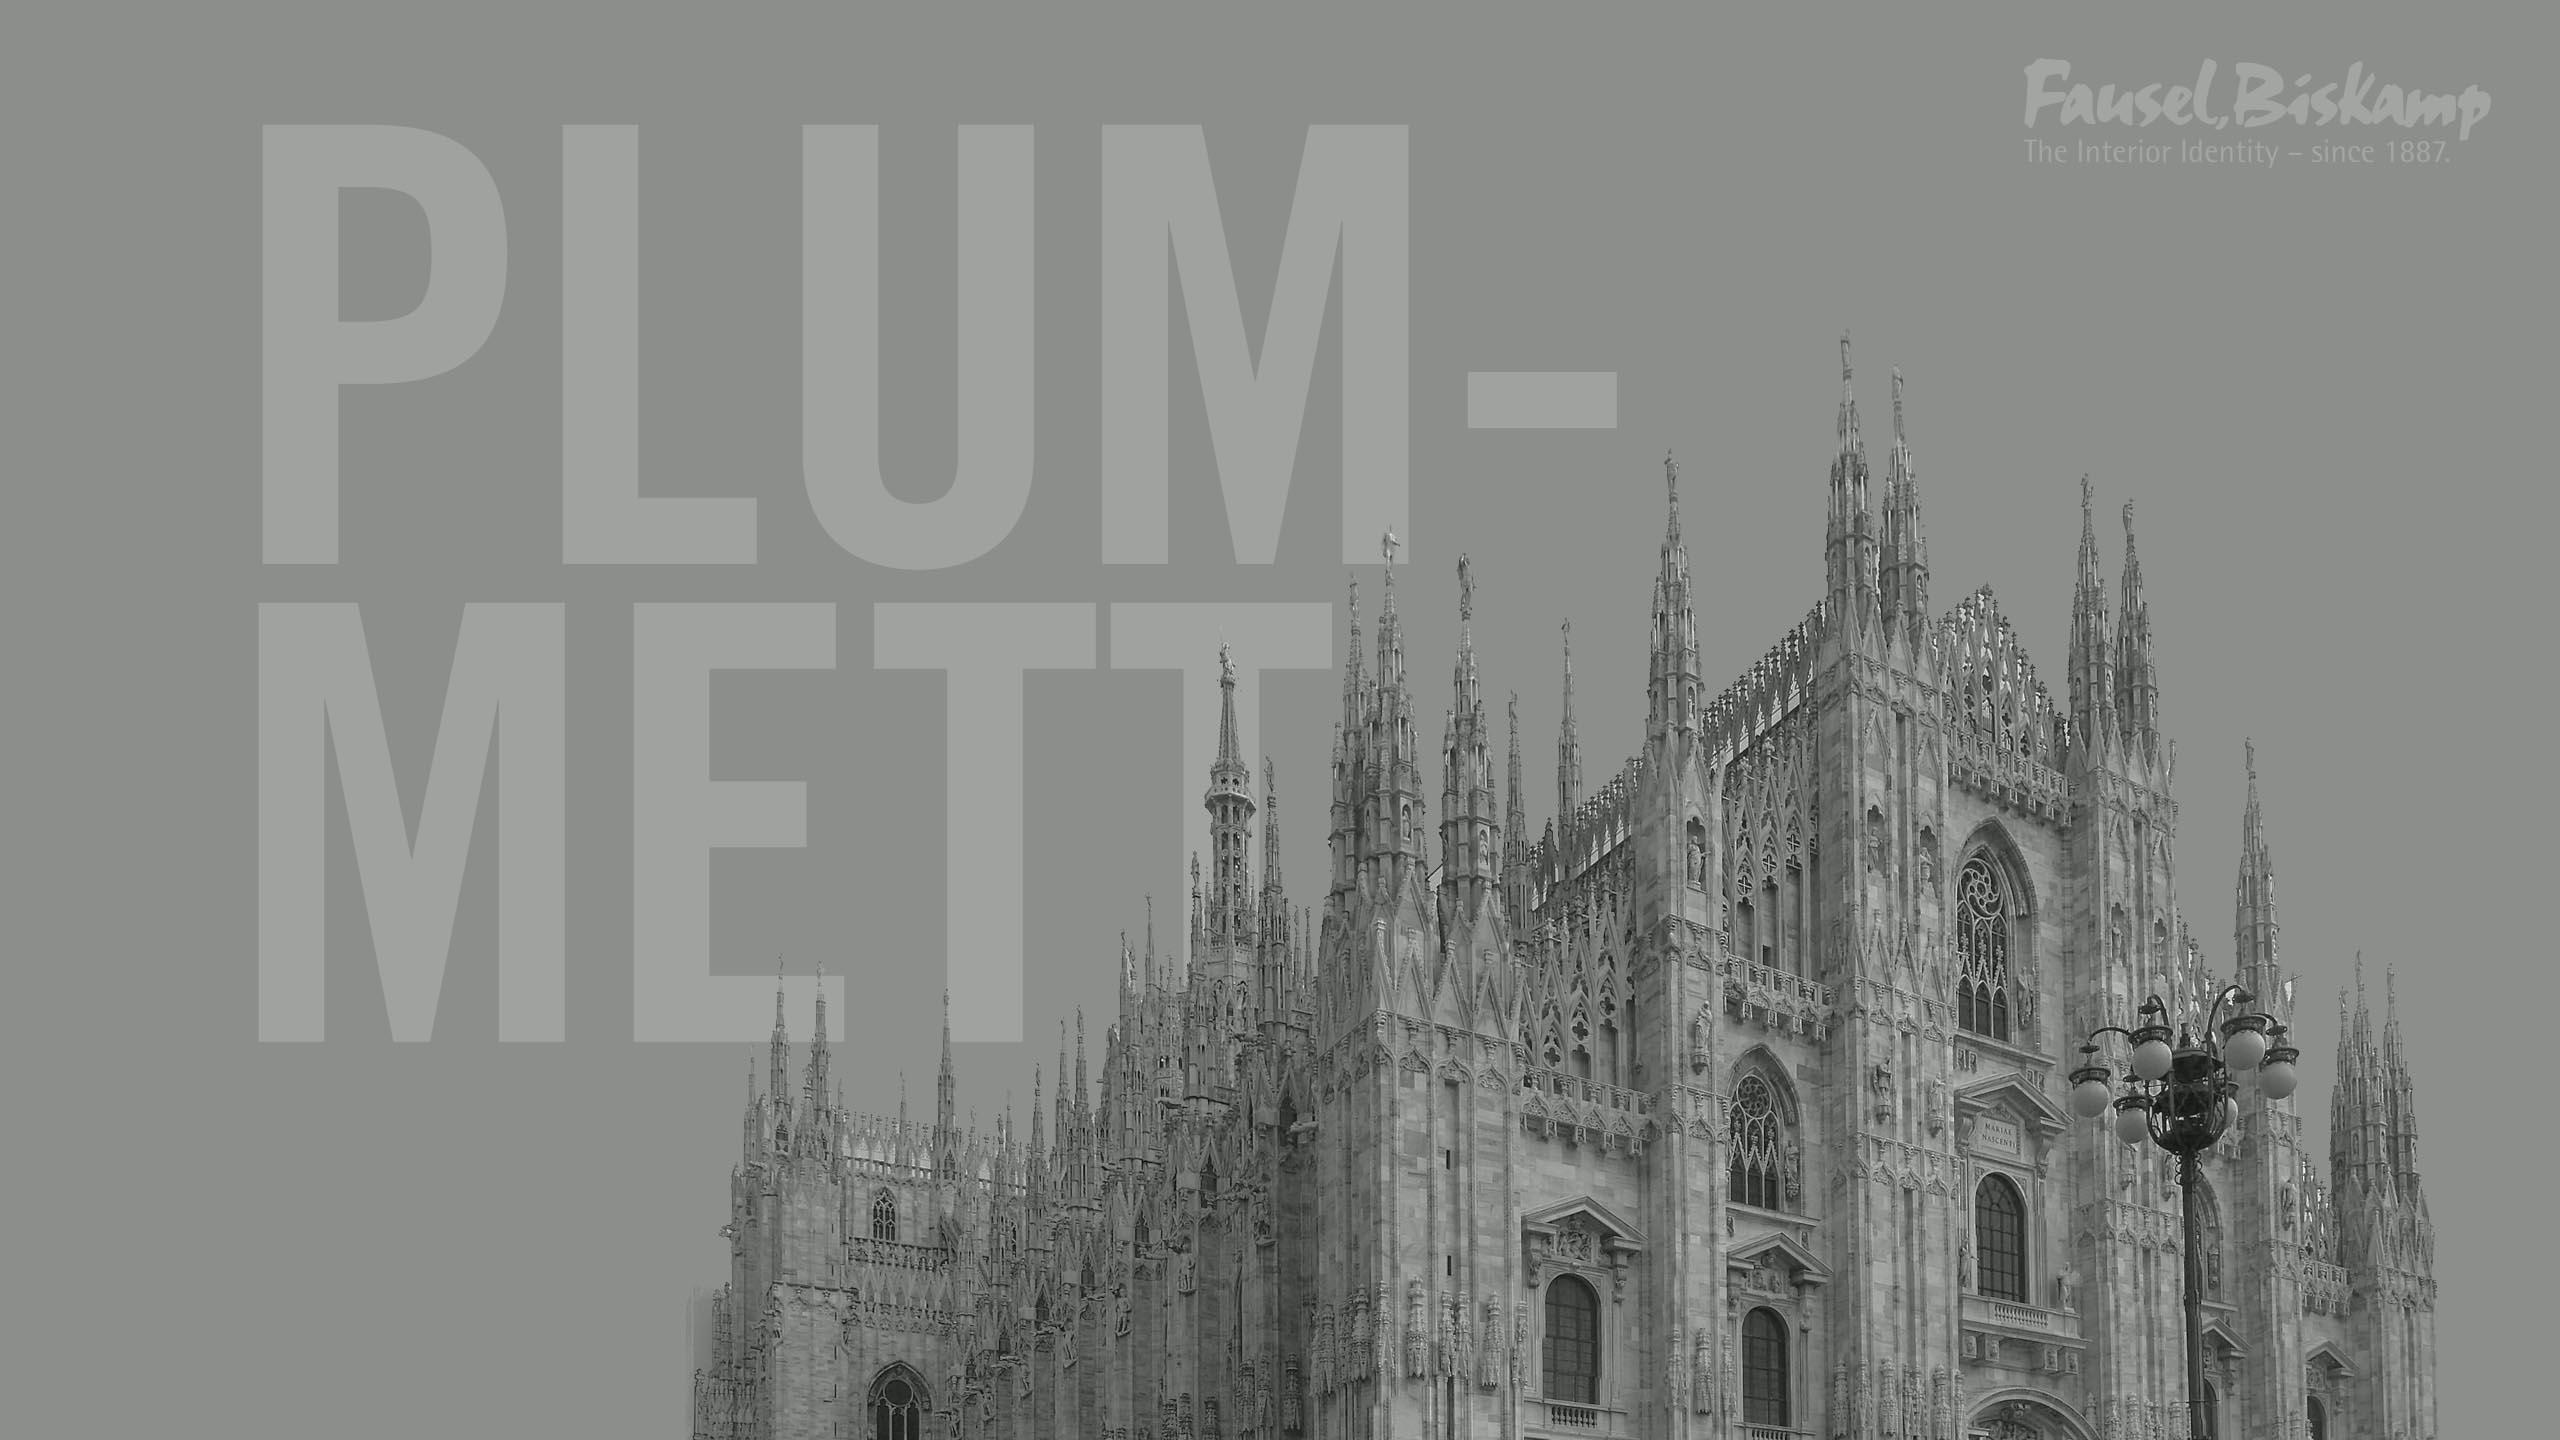 Plummett (No. 237)